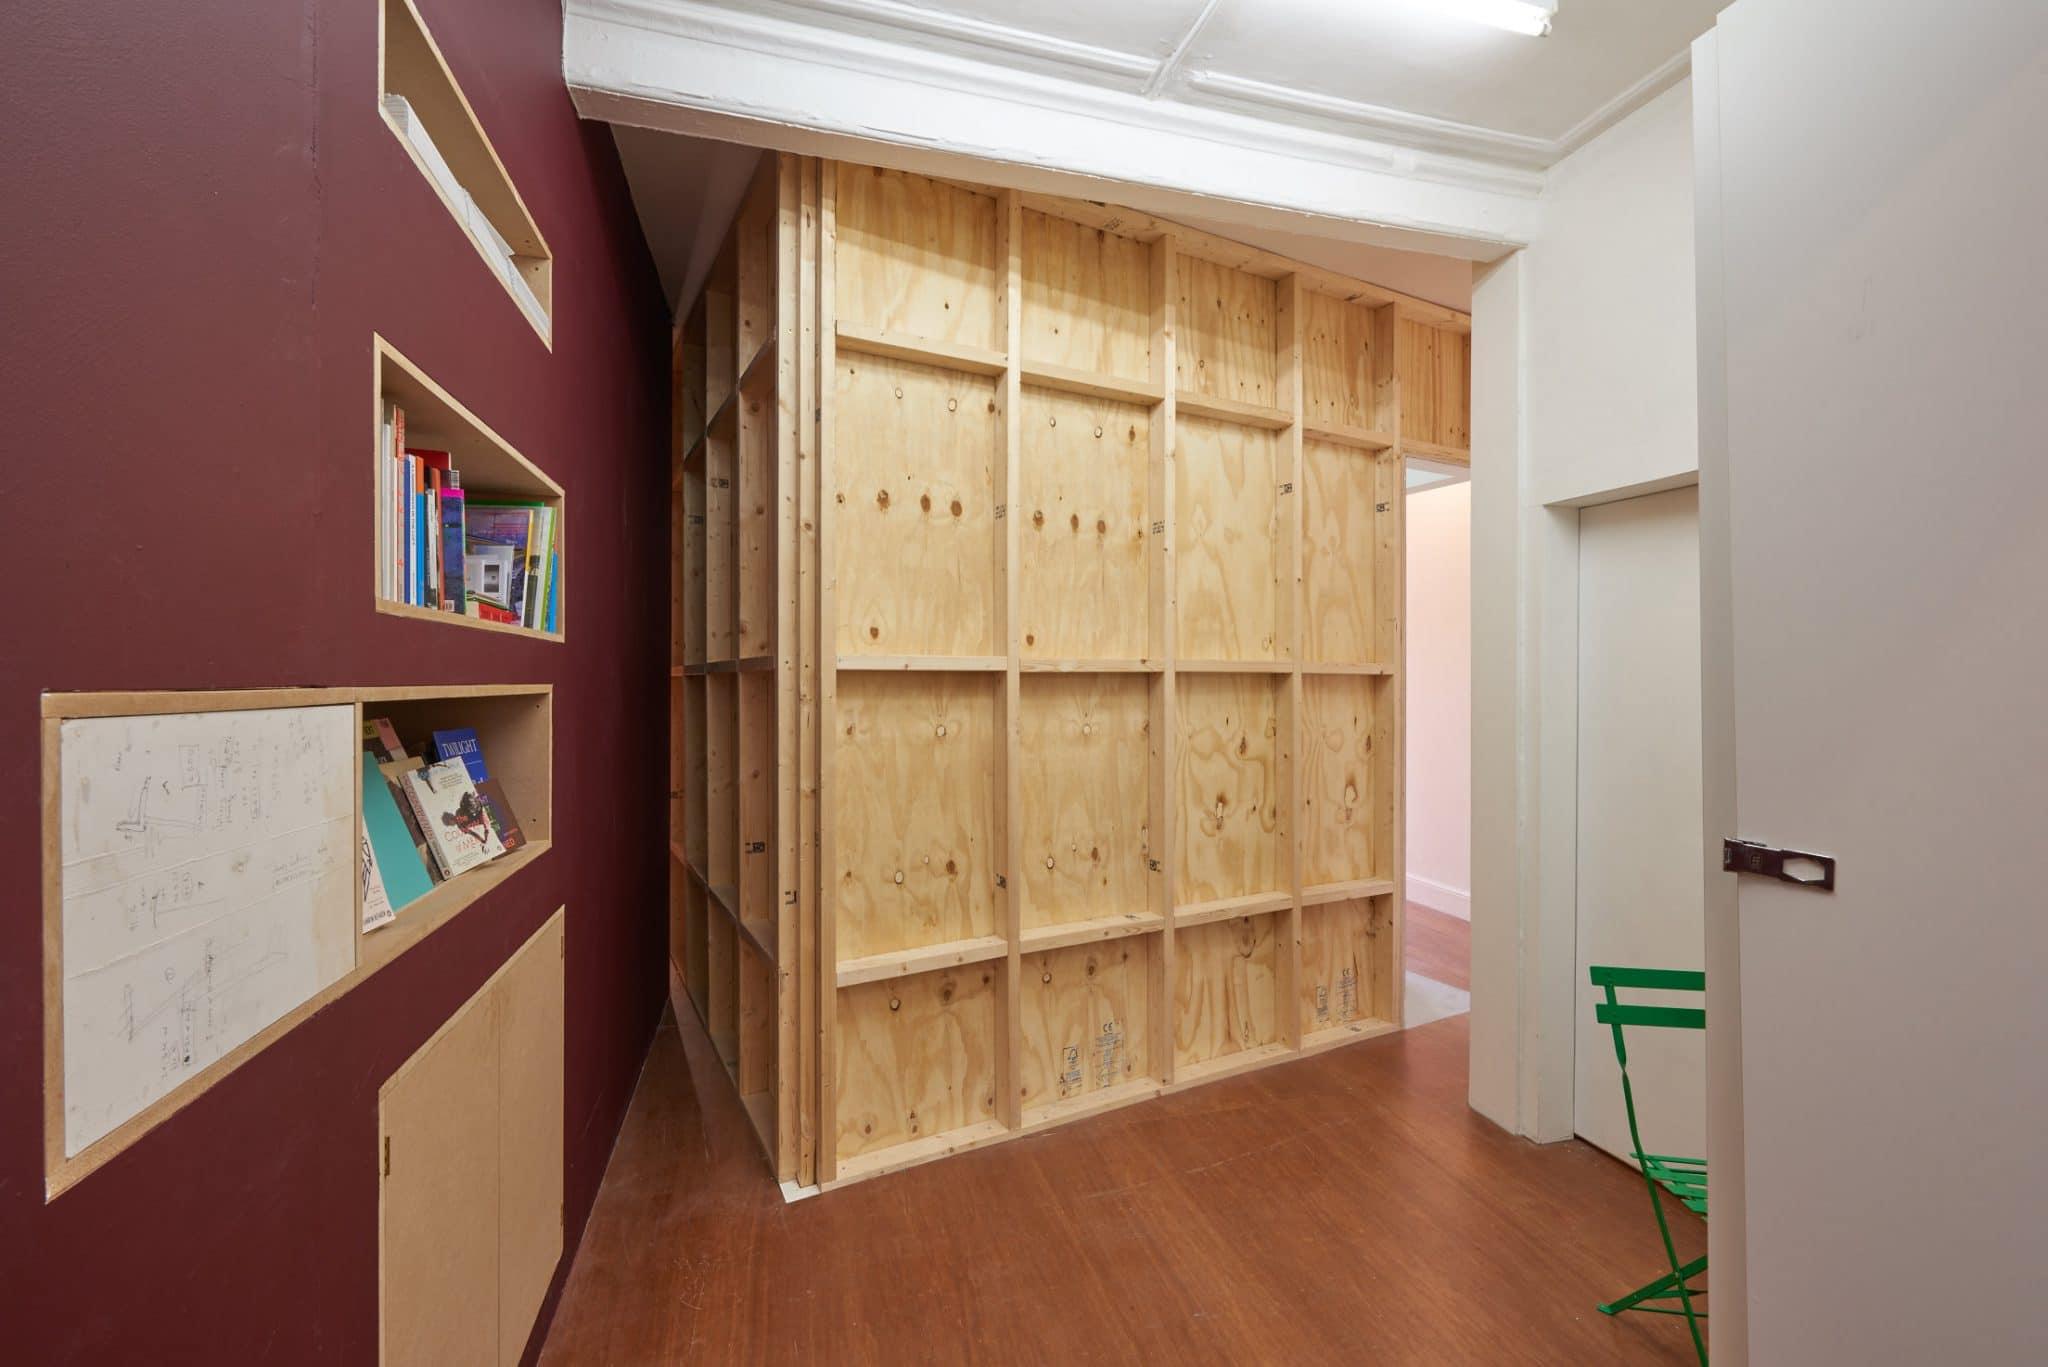 Matts Gallery